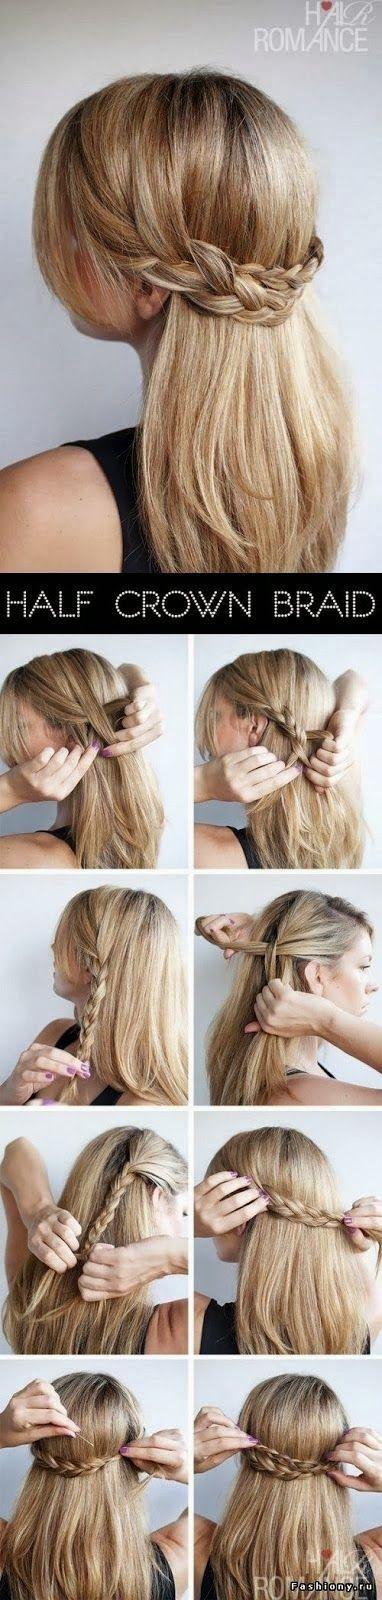 How-to: Half-Crown Braid